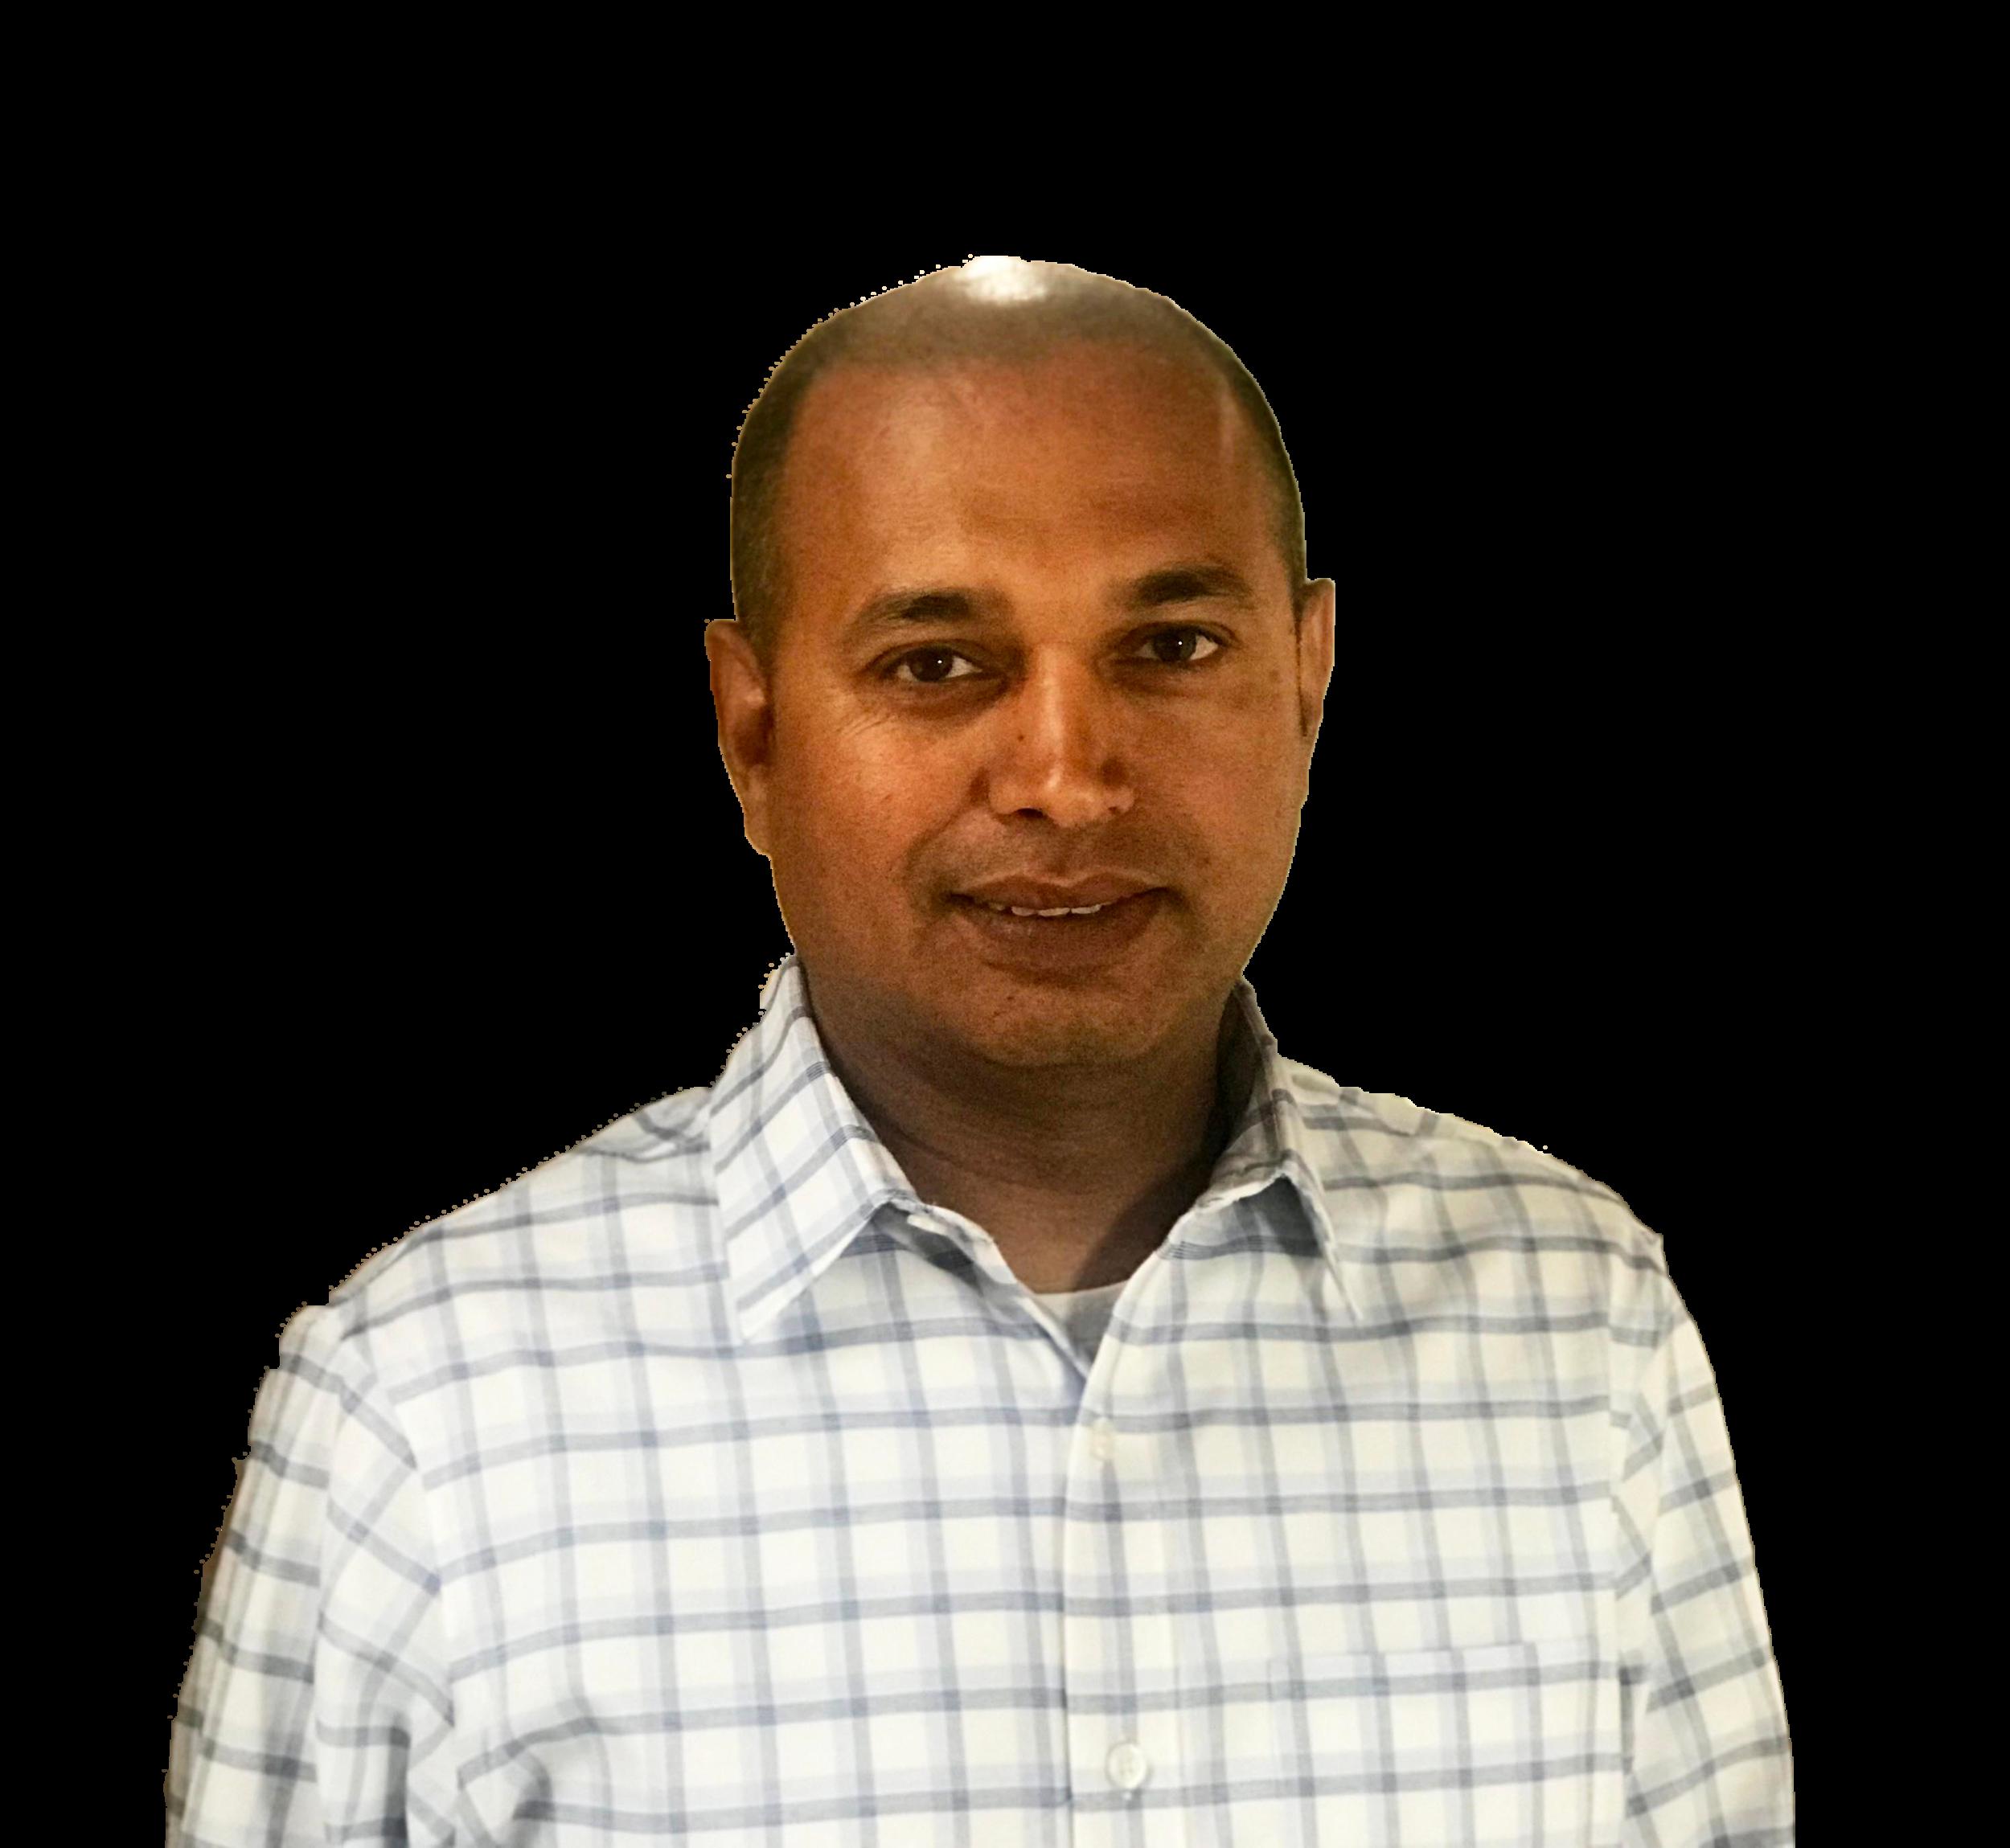 Timir Panchal